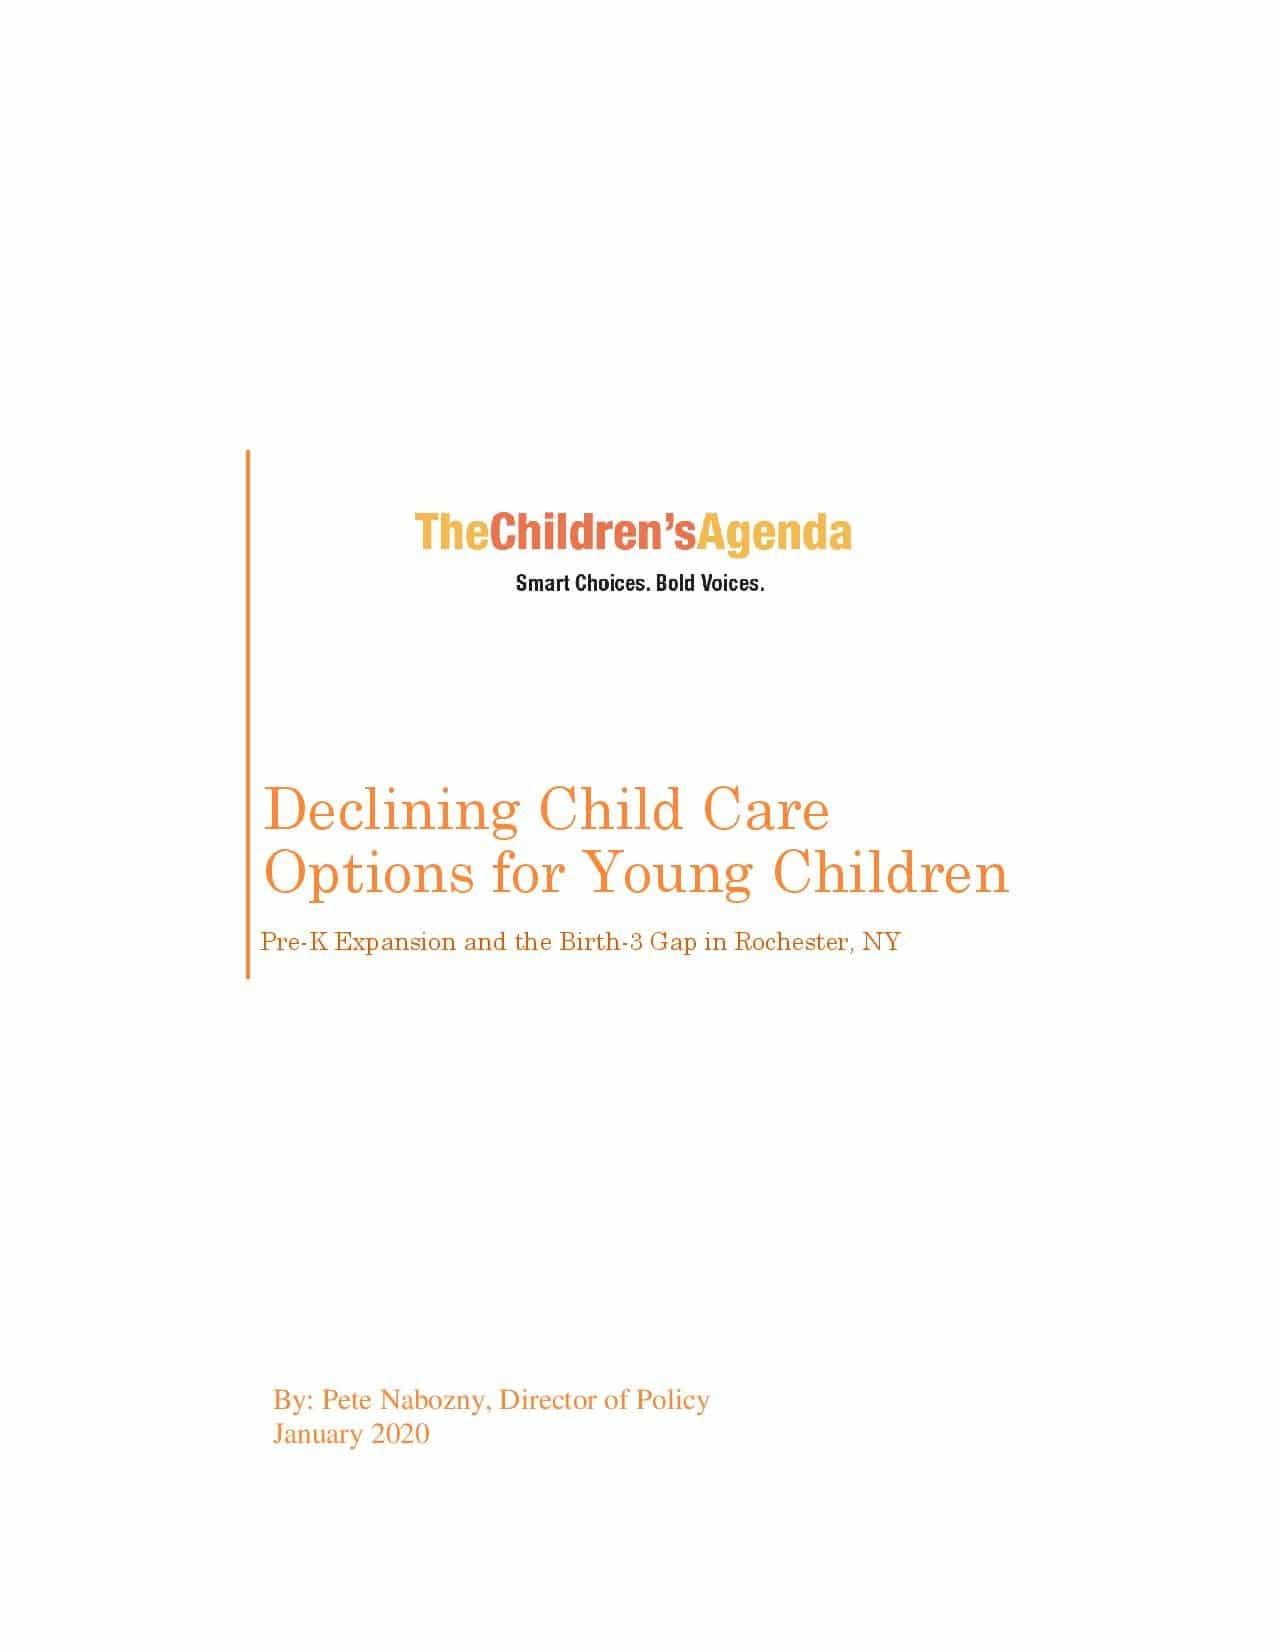 Child Care Report